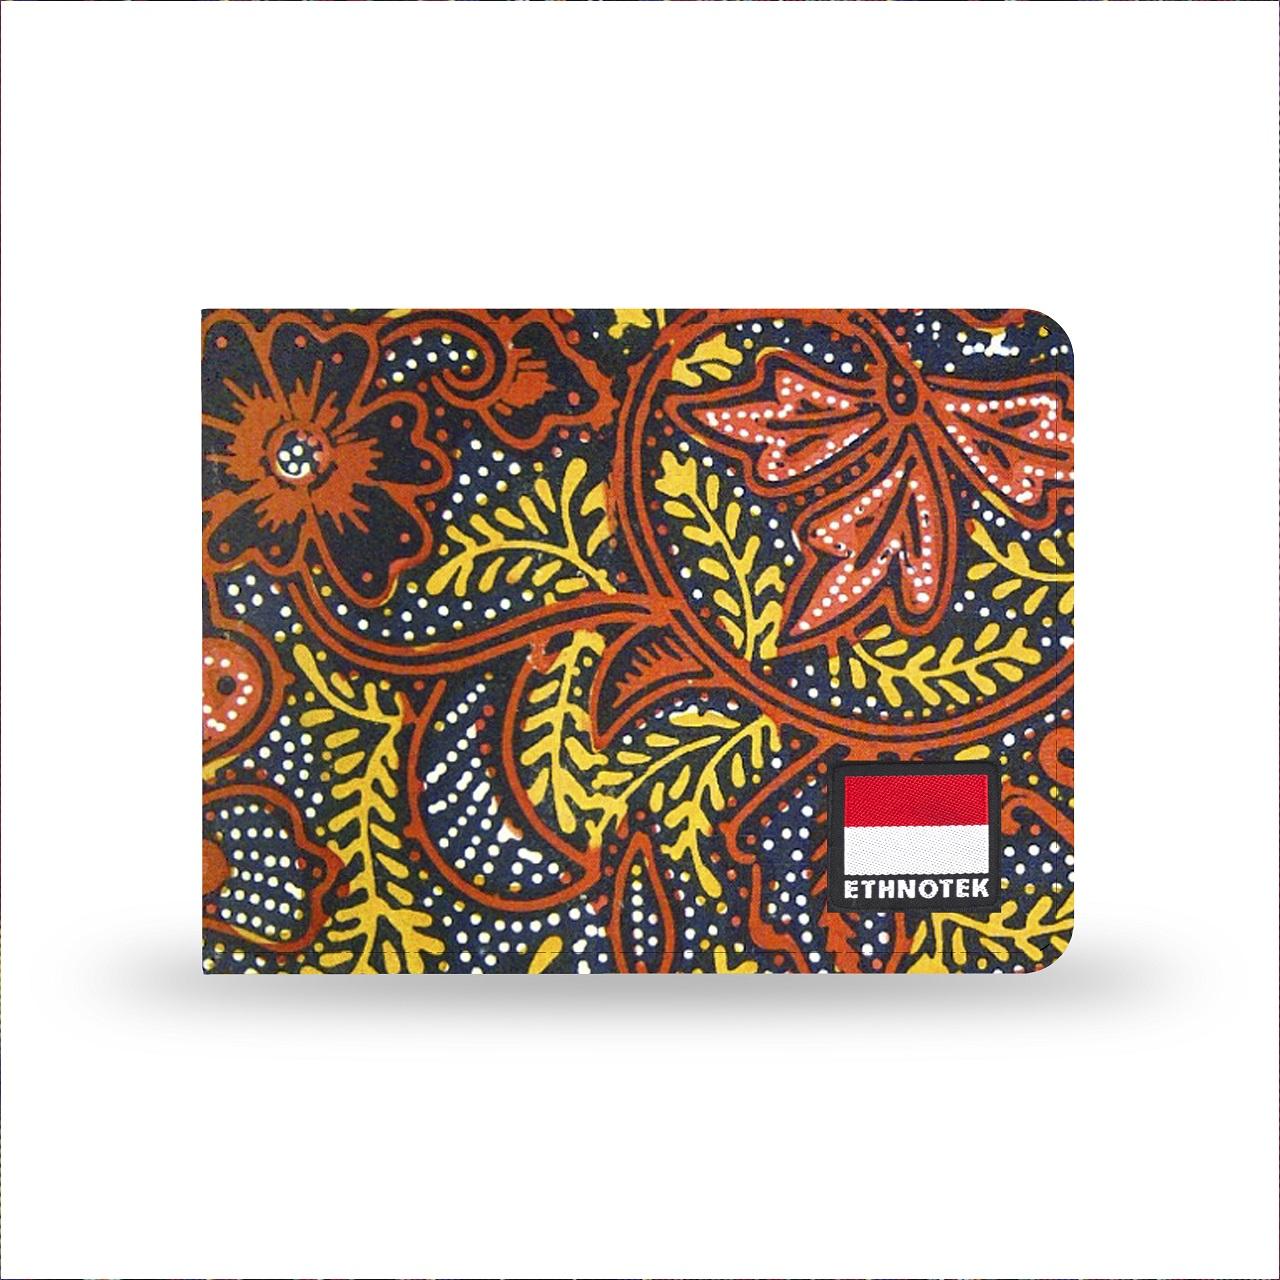 5a6759e90b34 The Ketat Wallet Wallet   Accessoires Ketat Bill Fold Wallet